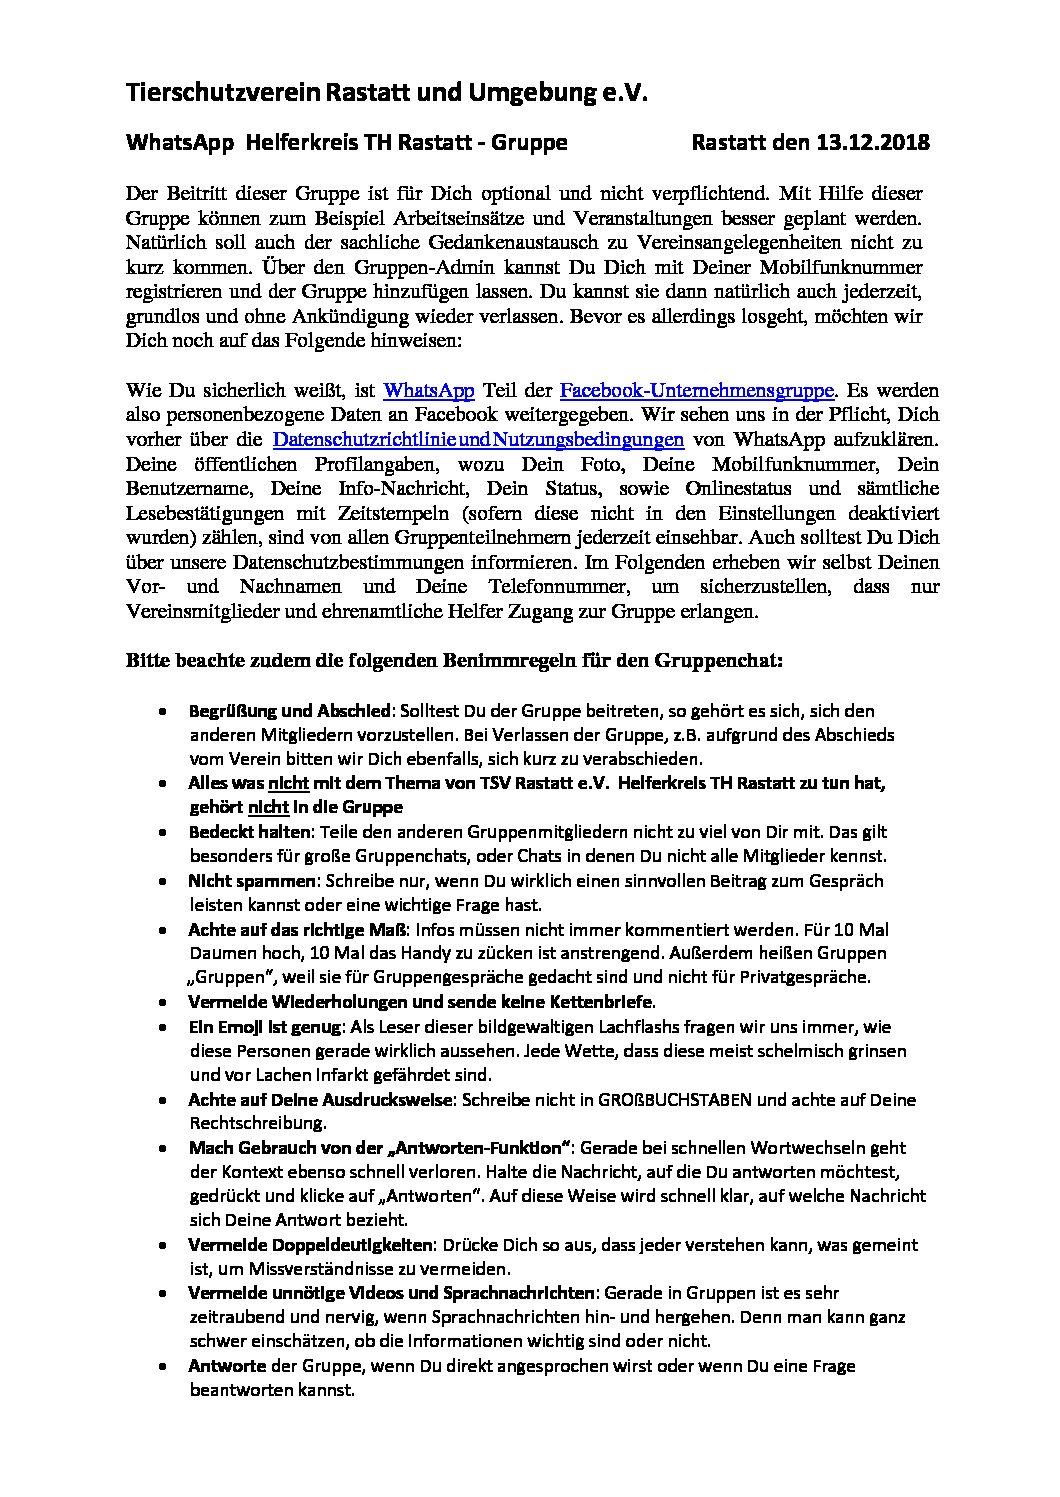 TSV-regeln-whatsapp-19.12.2018